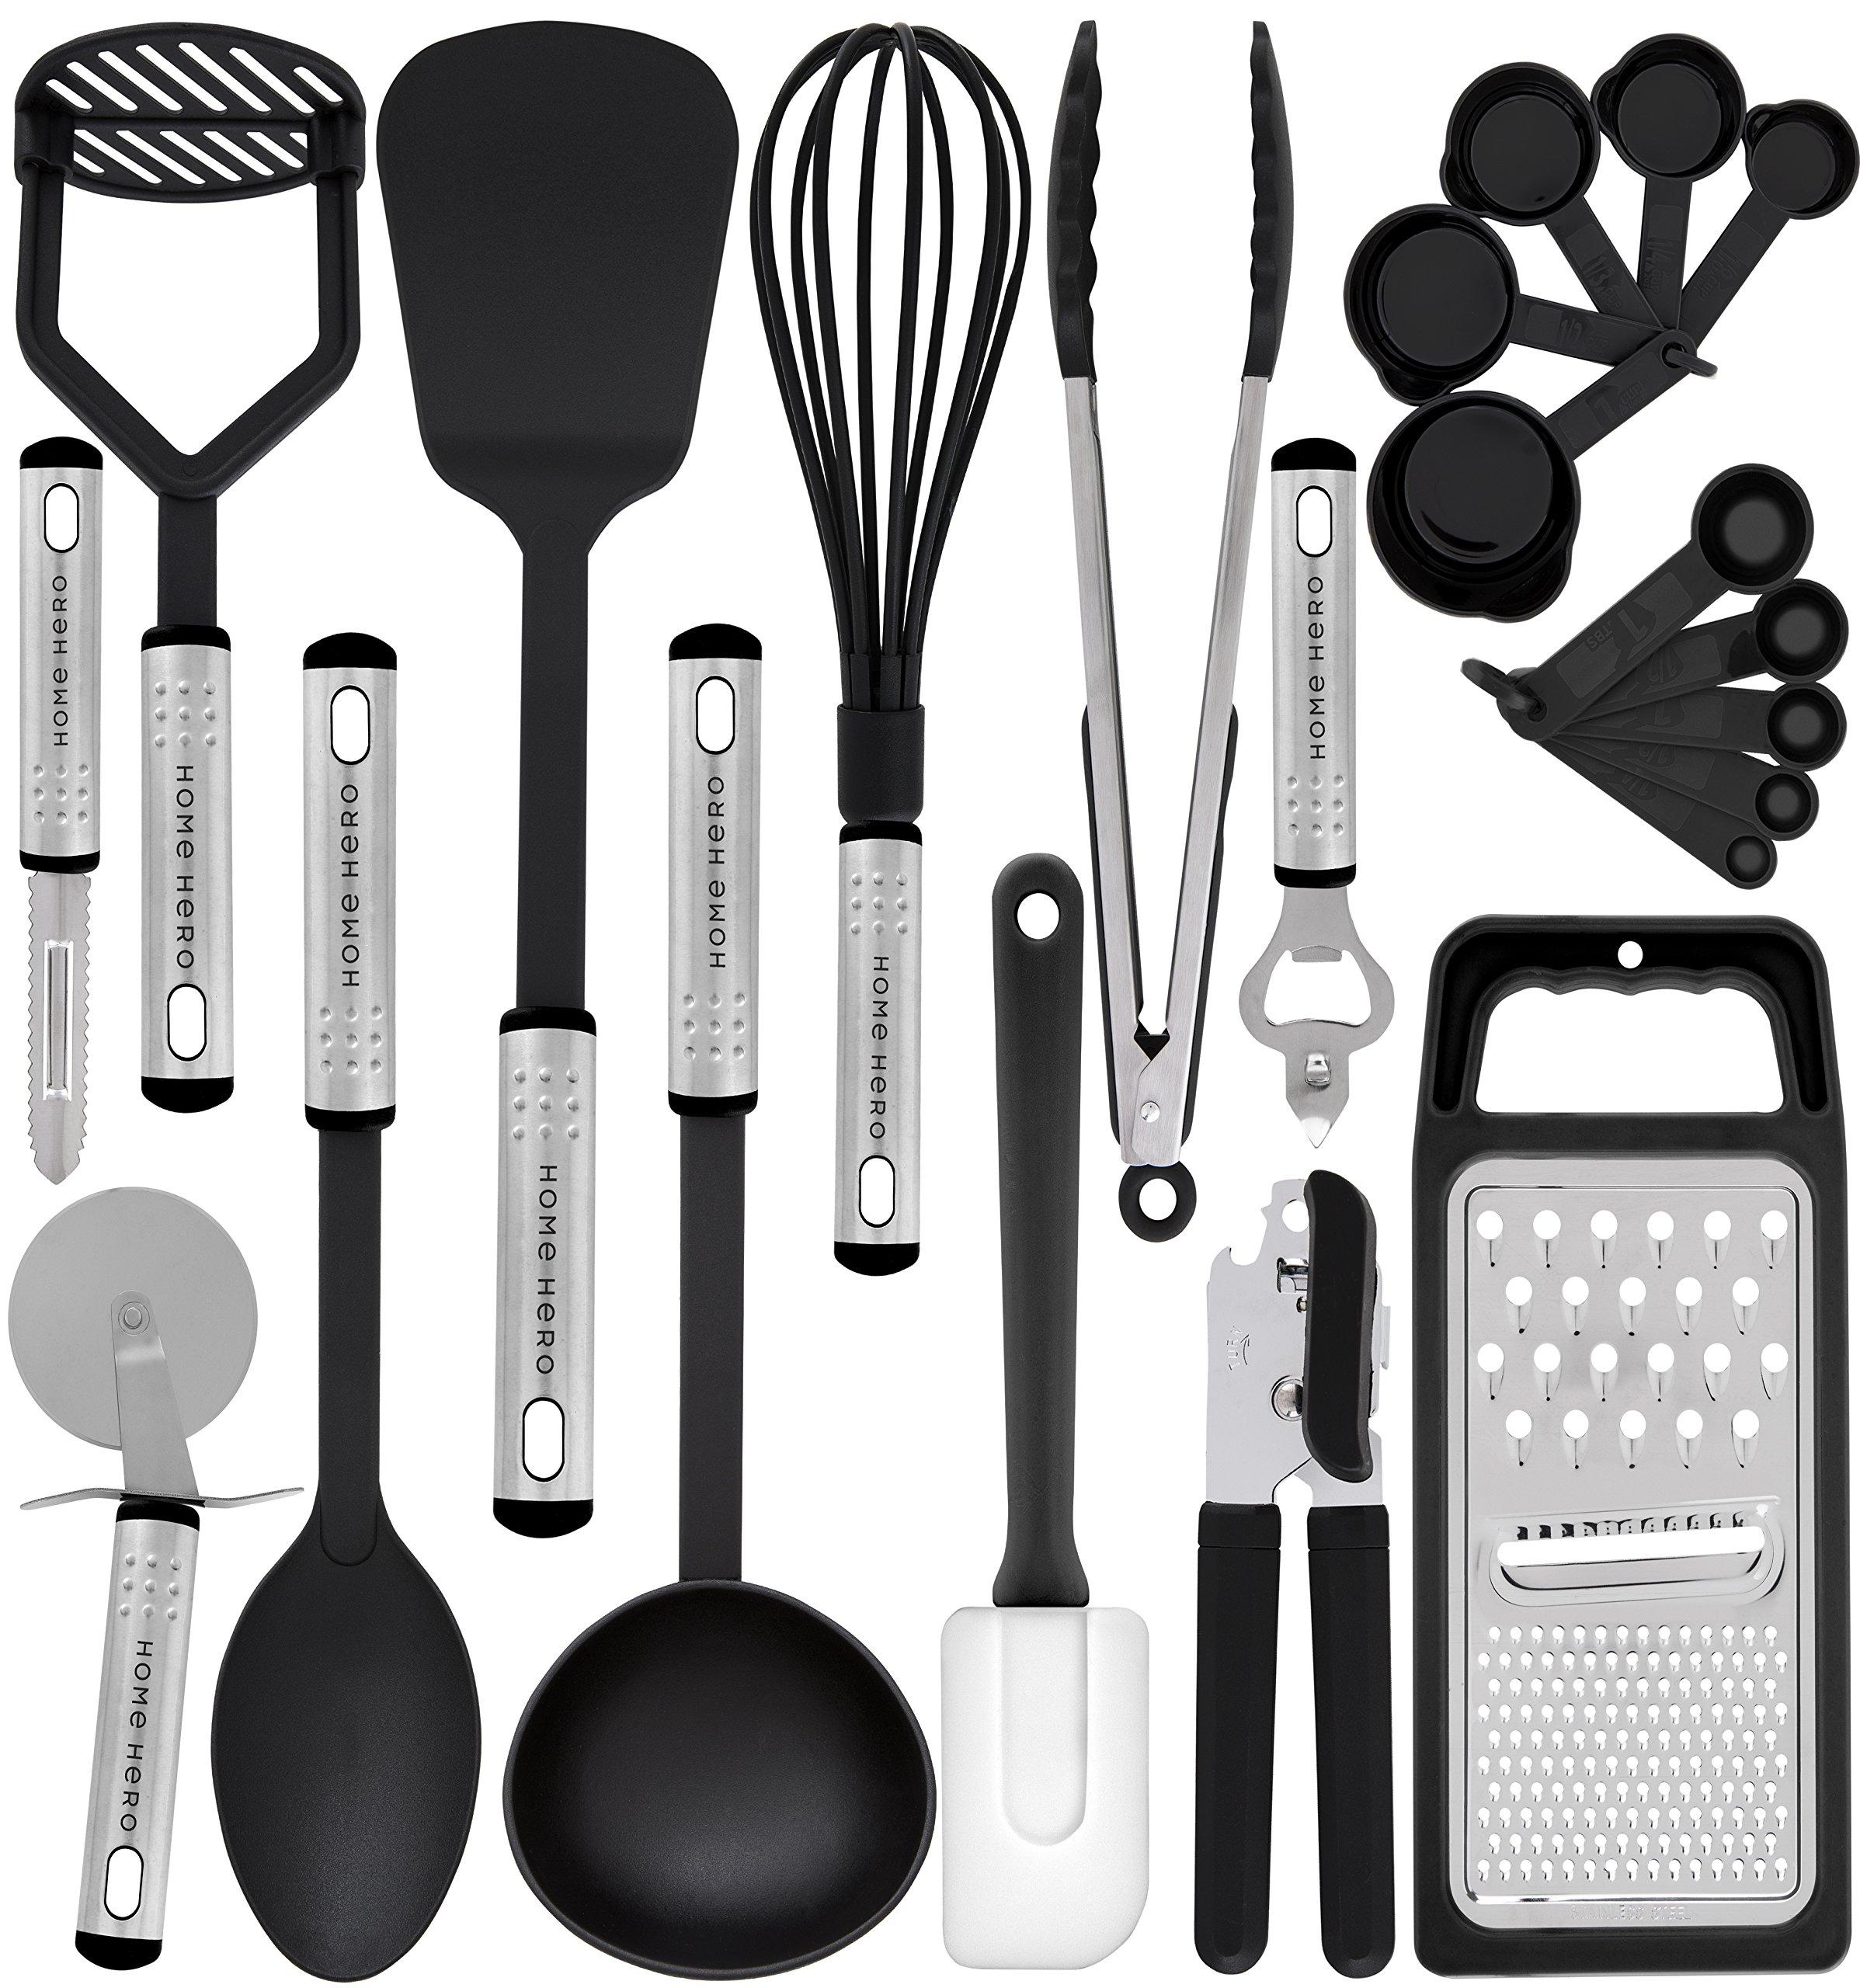 Kitchen Utensil Set - 23 Nylon Cooking Utensils - Kitchen Utensils with Spatula - Kitchen Gadgets Cookware Set - Best Kitchen Tool Set Gift by HomeHero by HomeHero (Image #1)